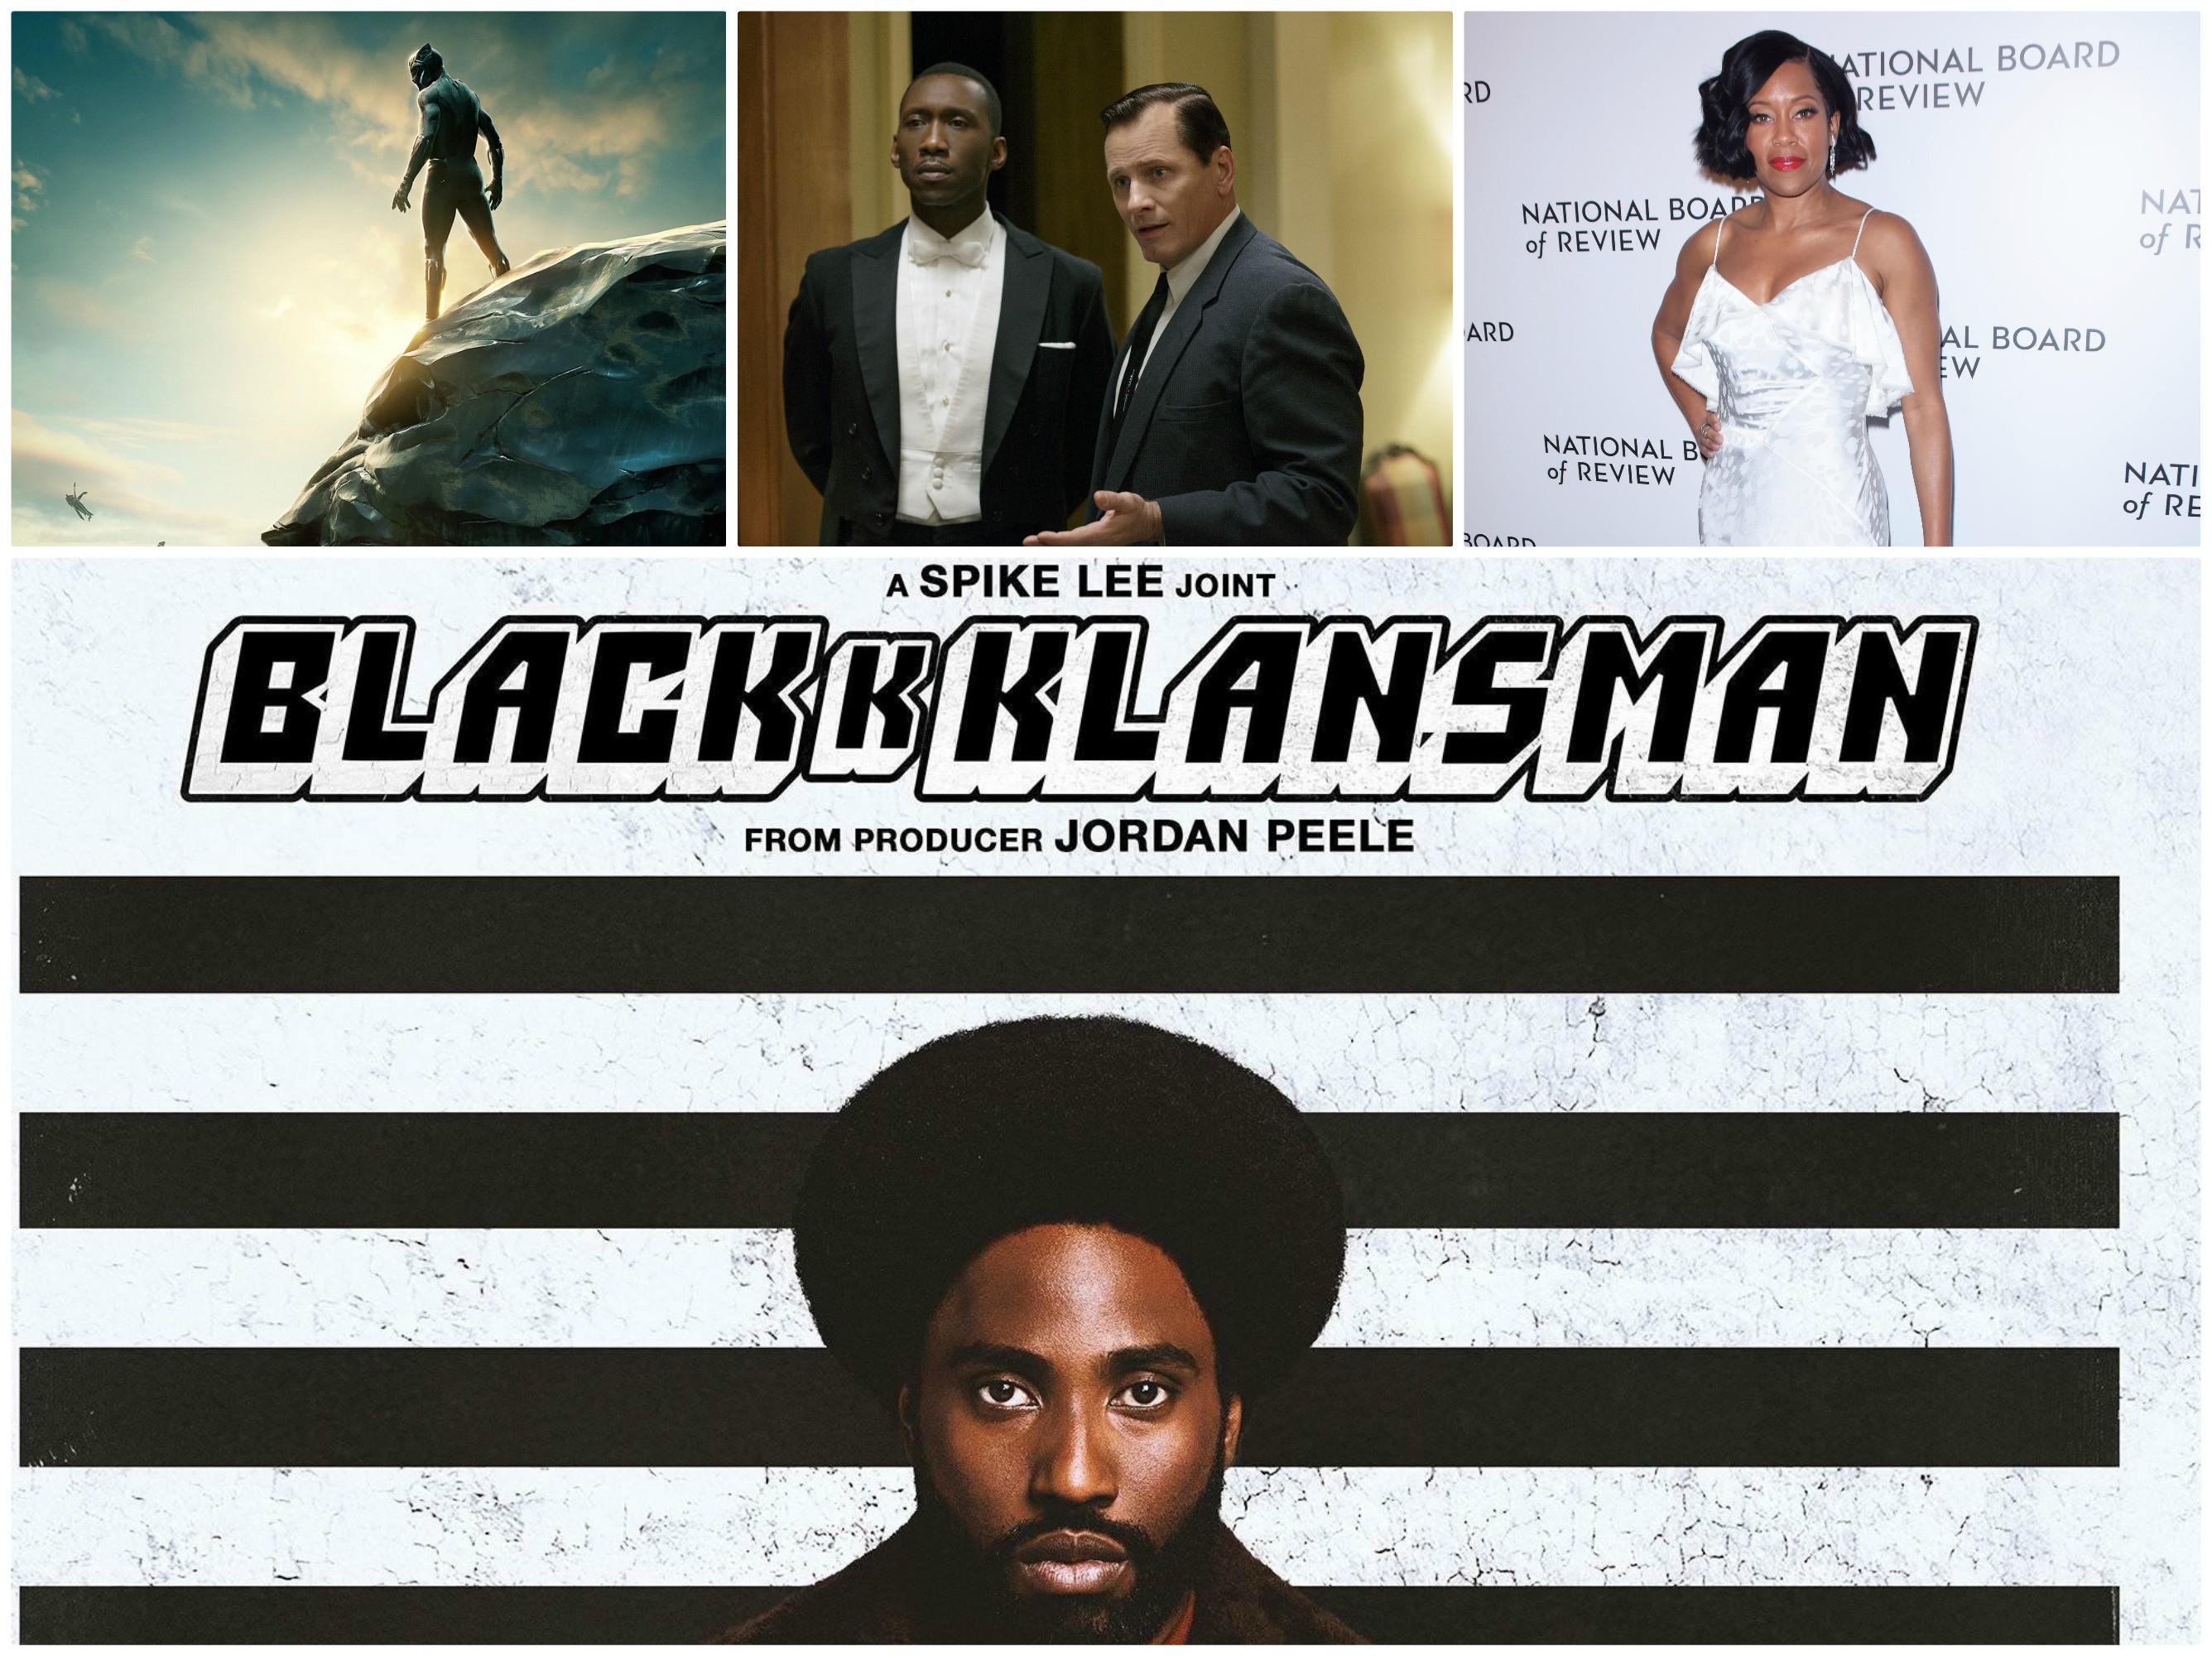 Oscar Nominated Black Talent